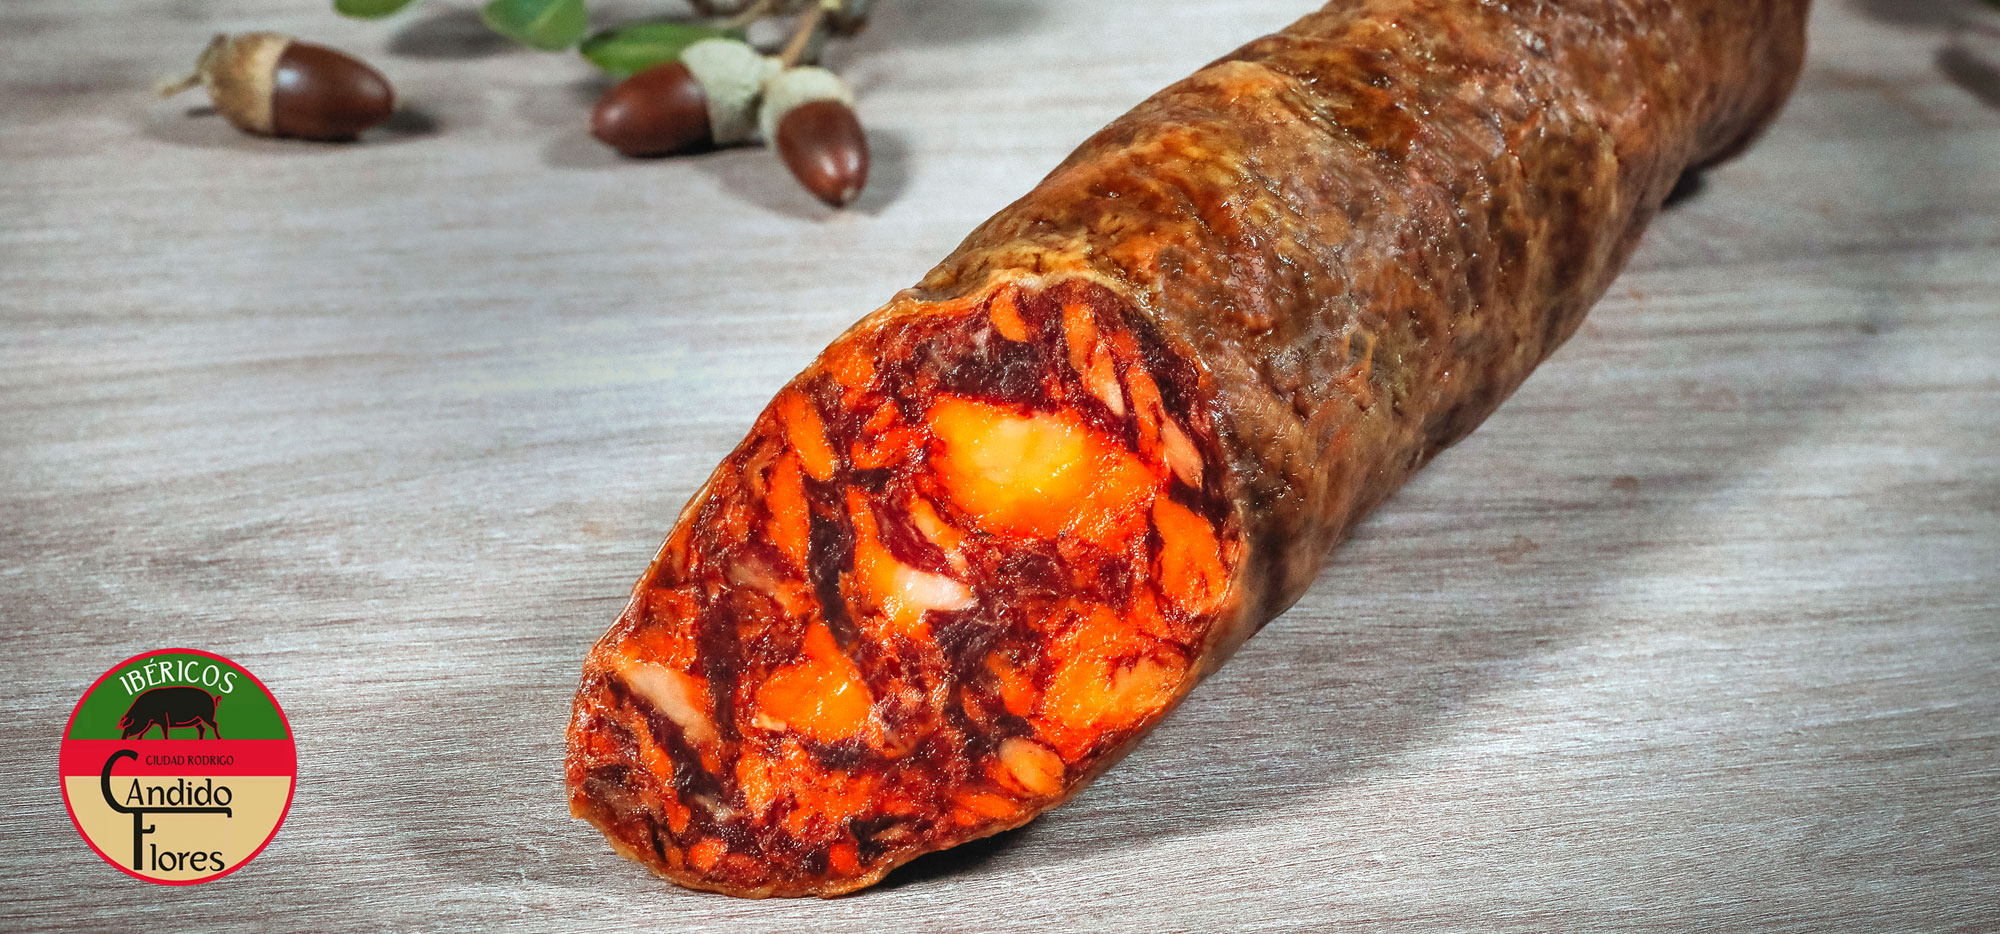 Chorizo ibérico de bellota de Salamanca - Ciudad Rodrigo